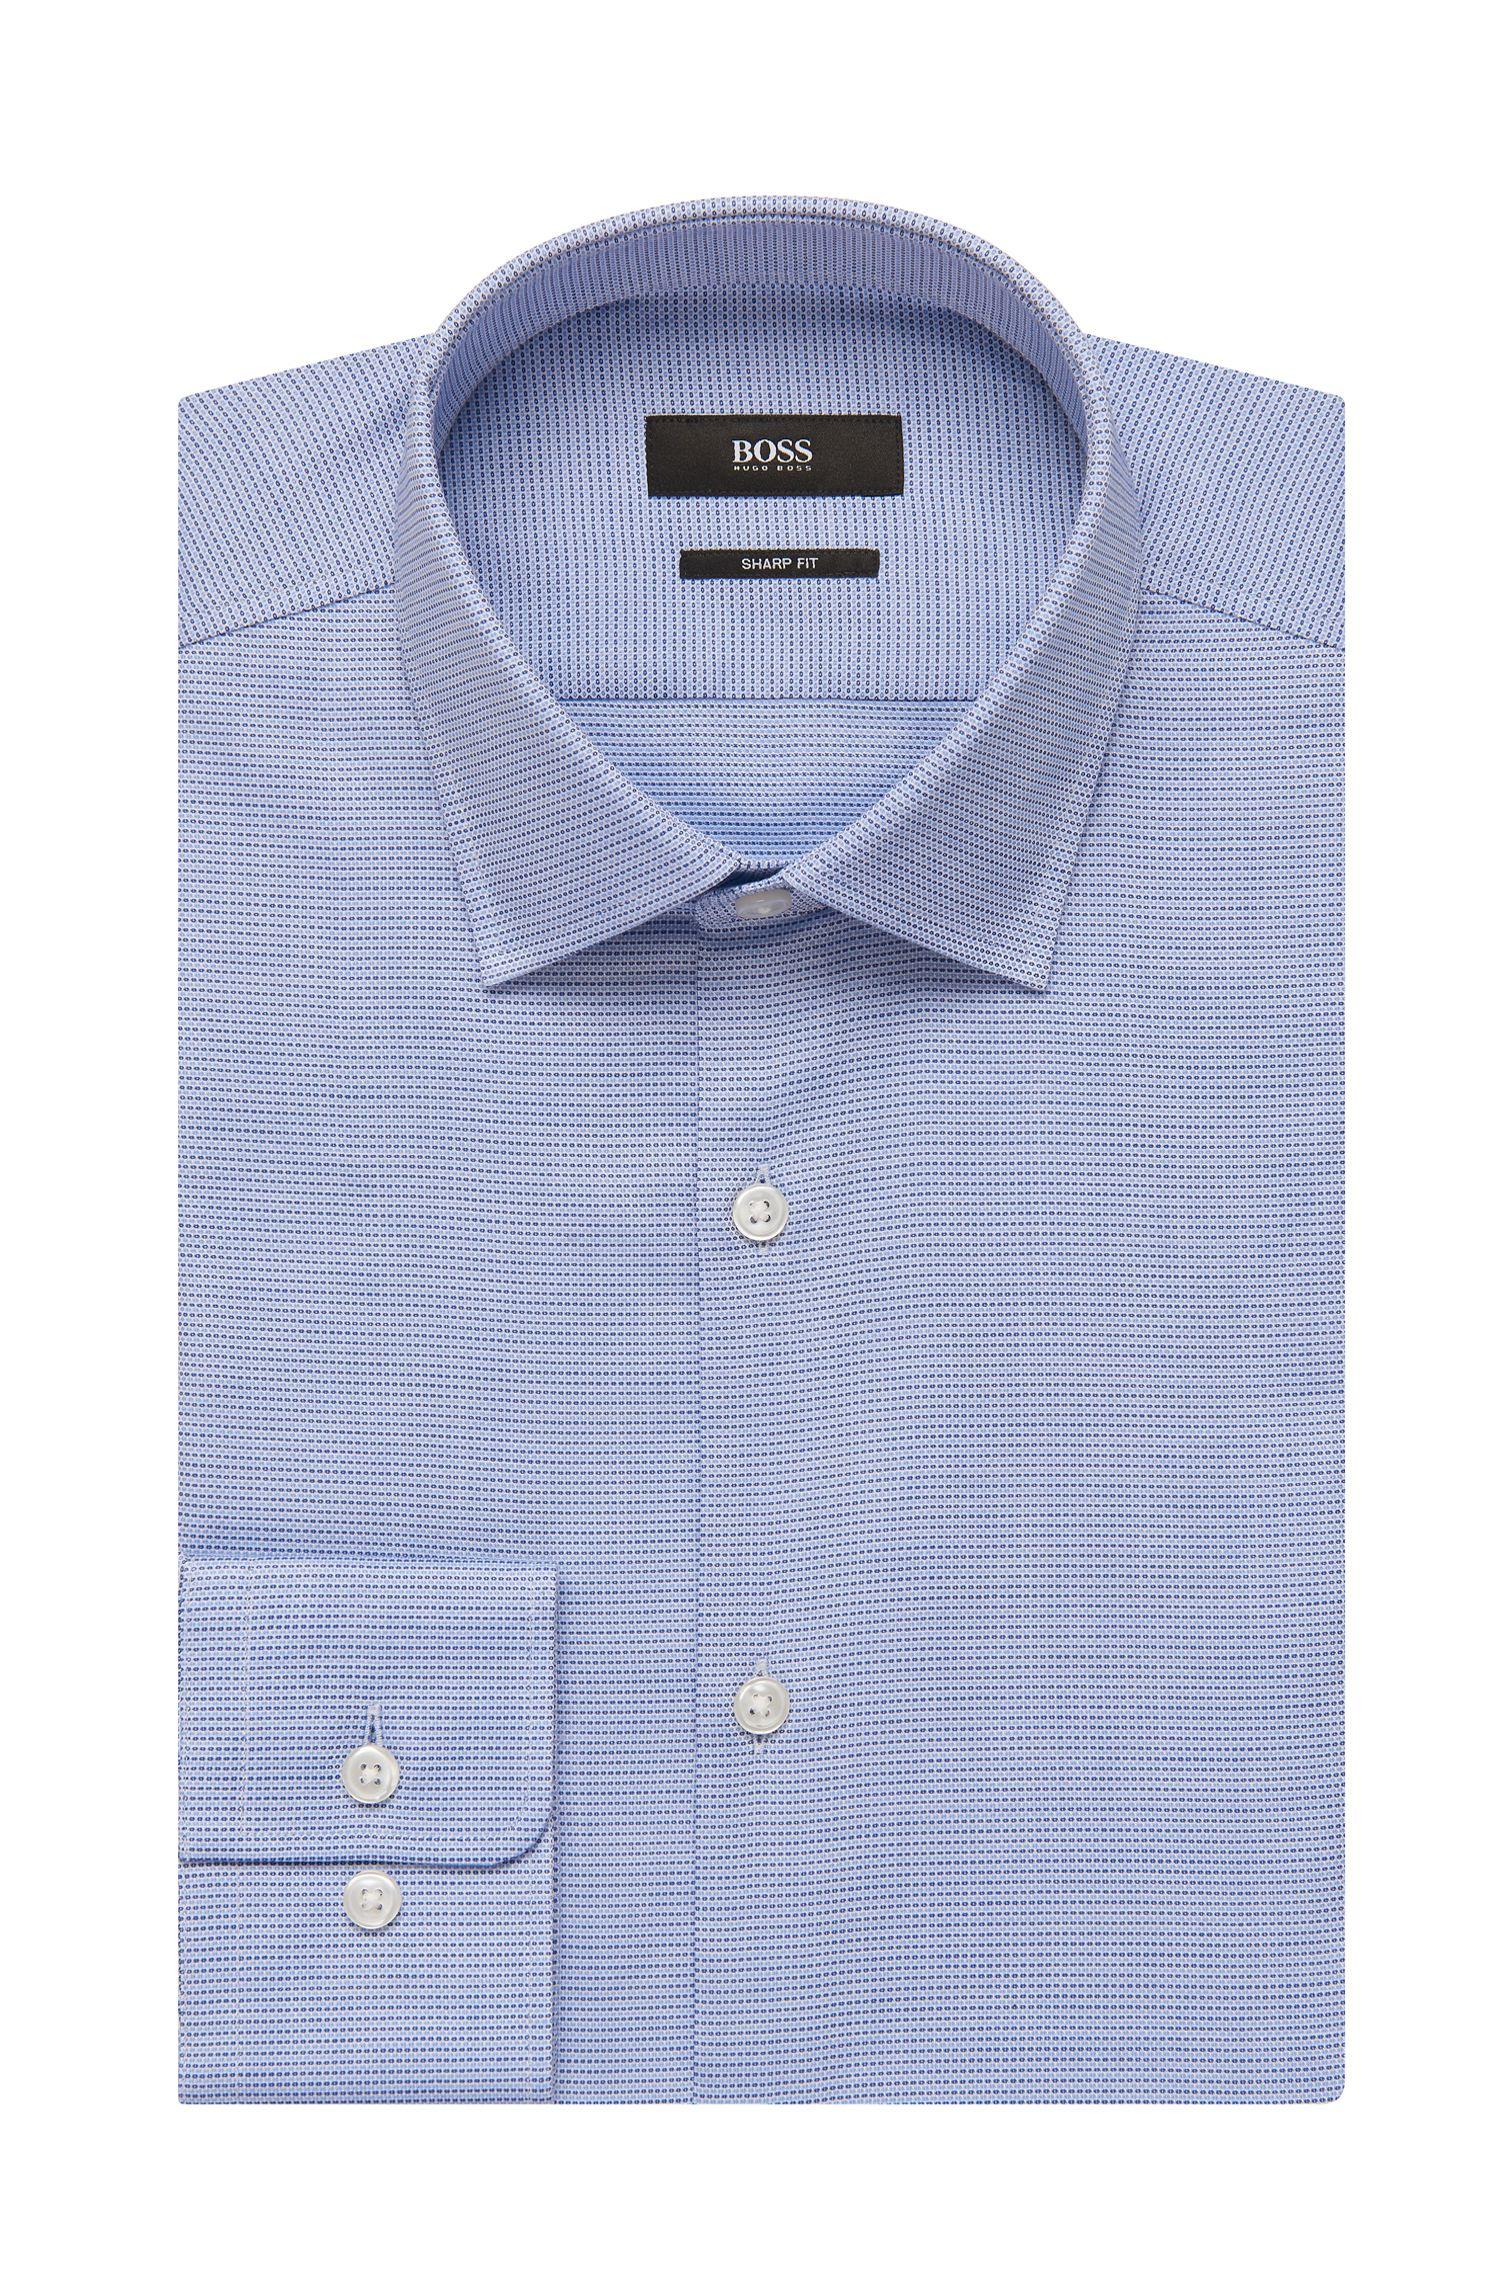 Geometric Cotton Dress Shirt, Sharp Fit | Marley US